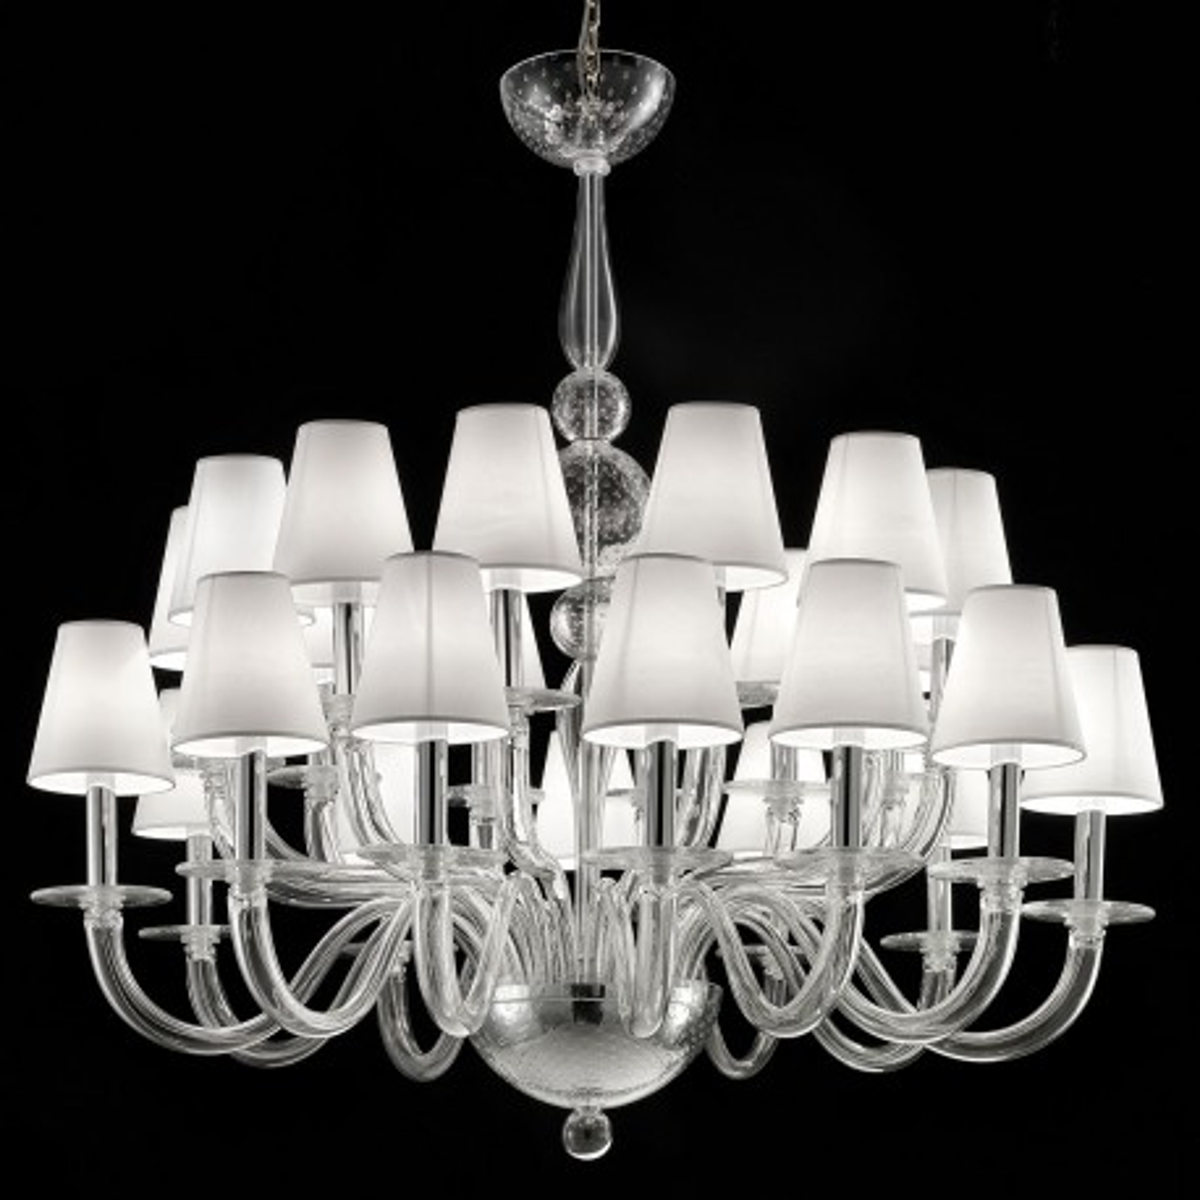 """Vasco"" lustre en verre de Murano - 12 + 12 lumieres, transparent"